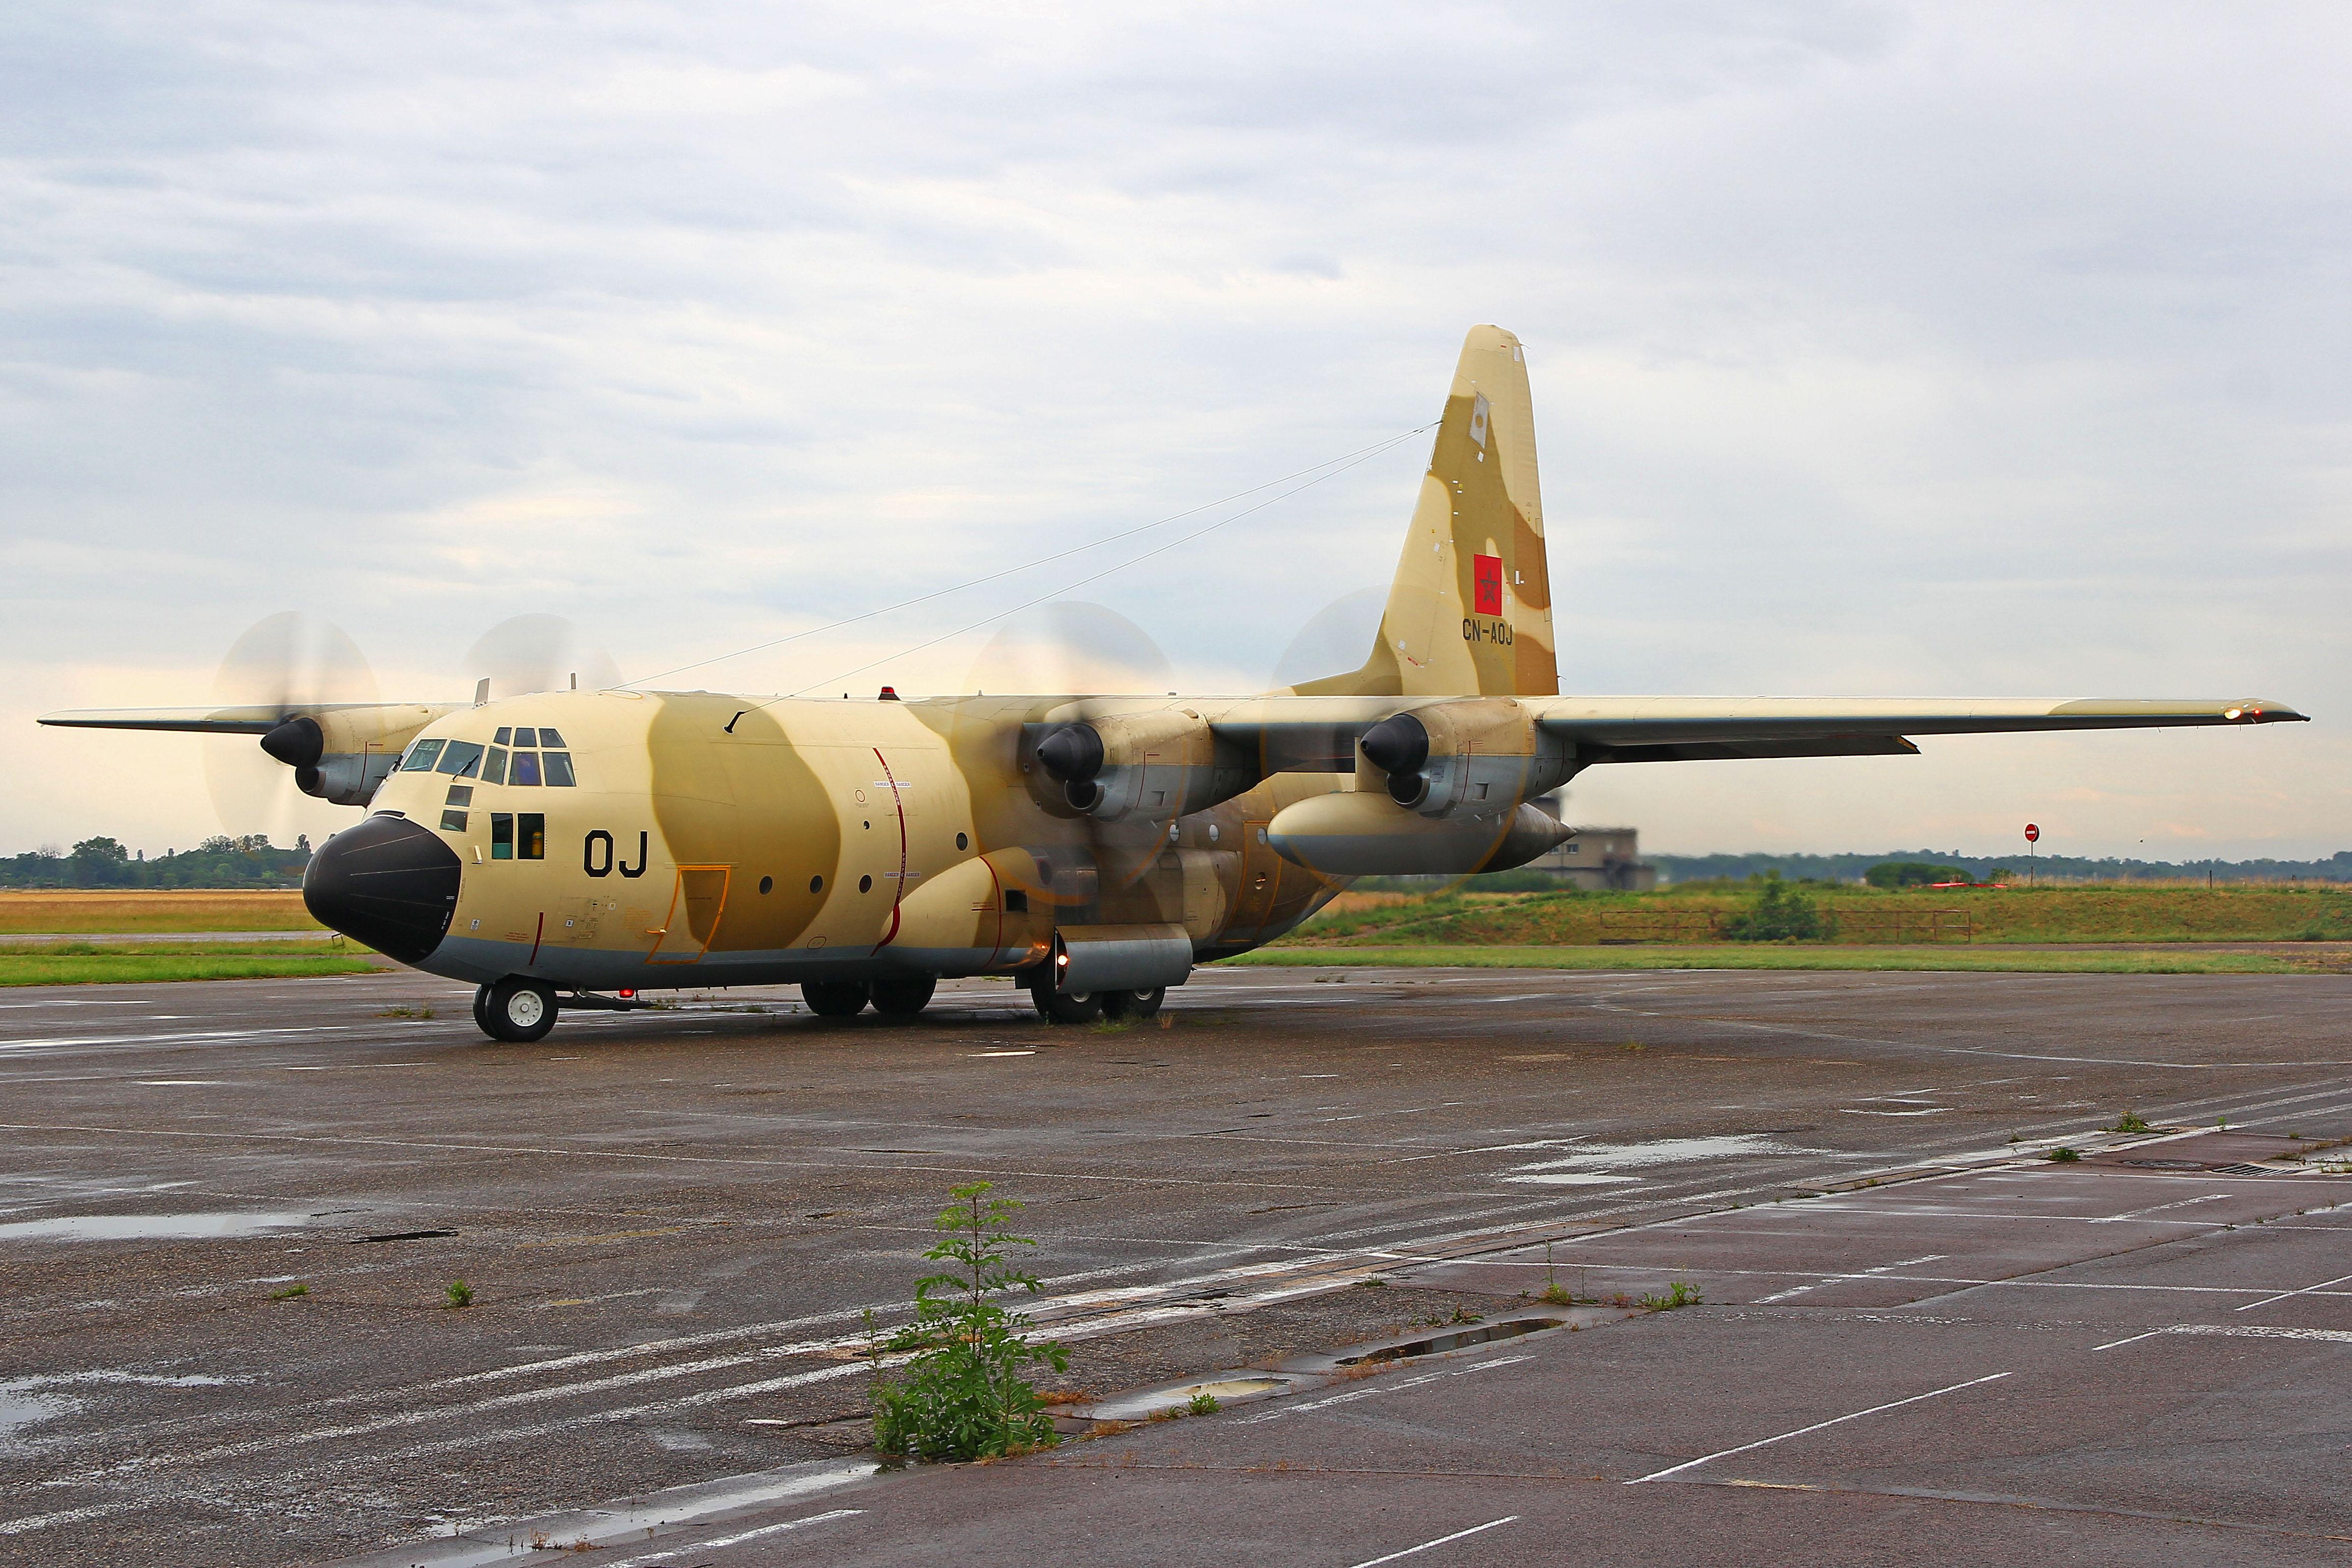 FRA: Photos d'avions de transport - Page 40 49999112162_a805fc434f_o_d